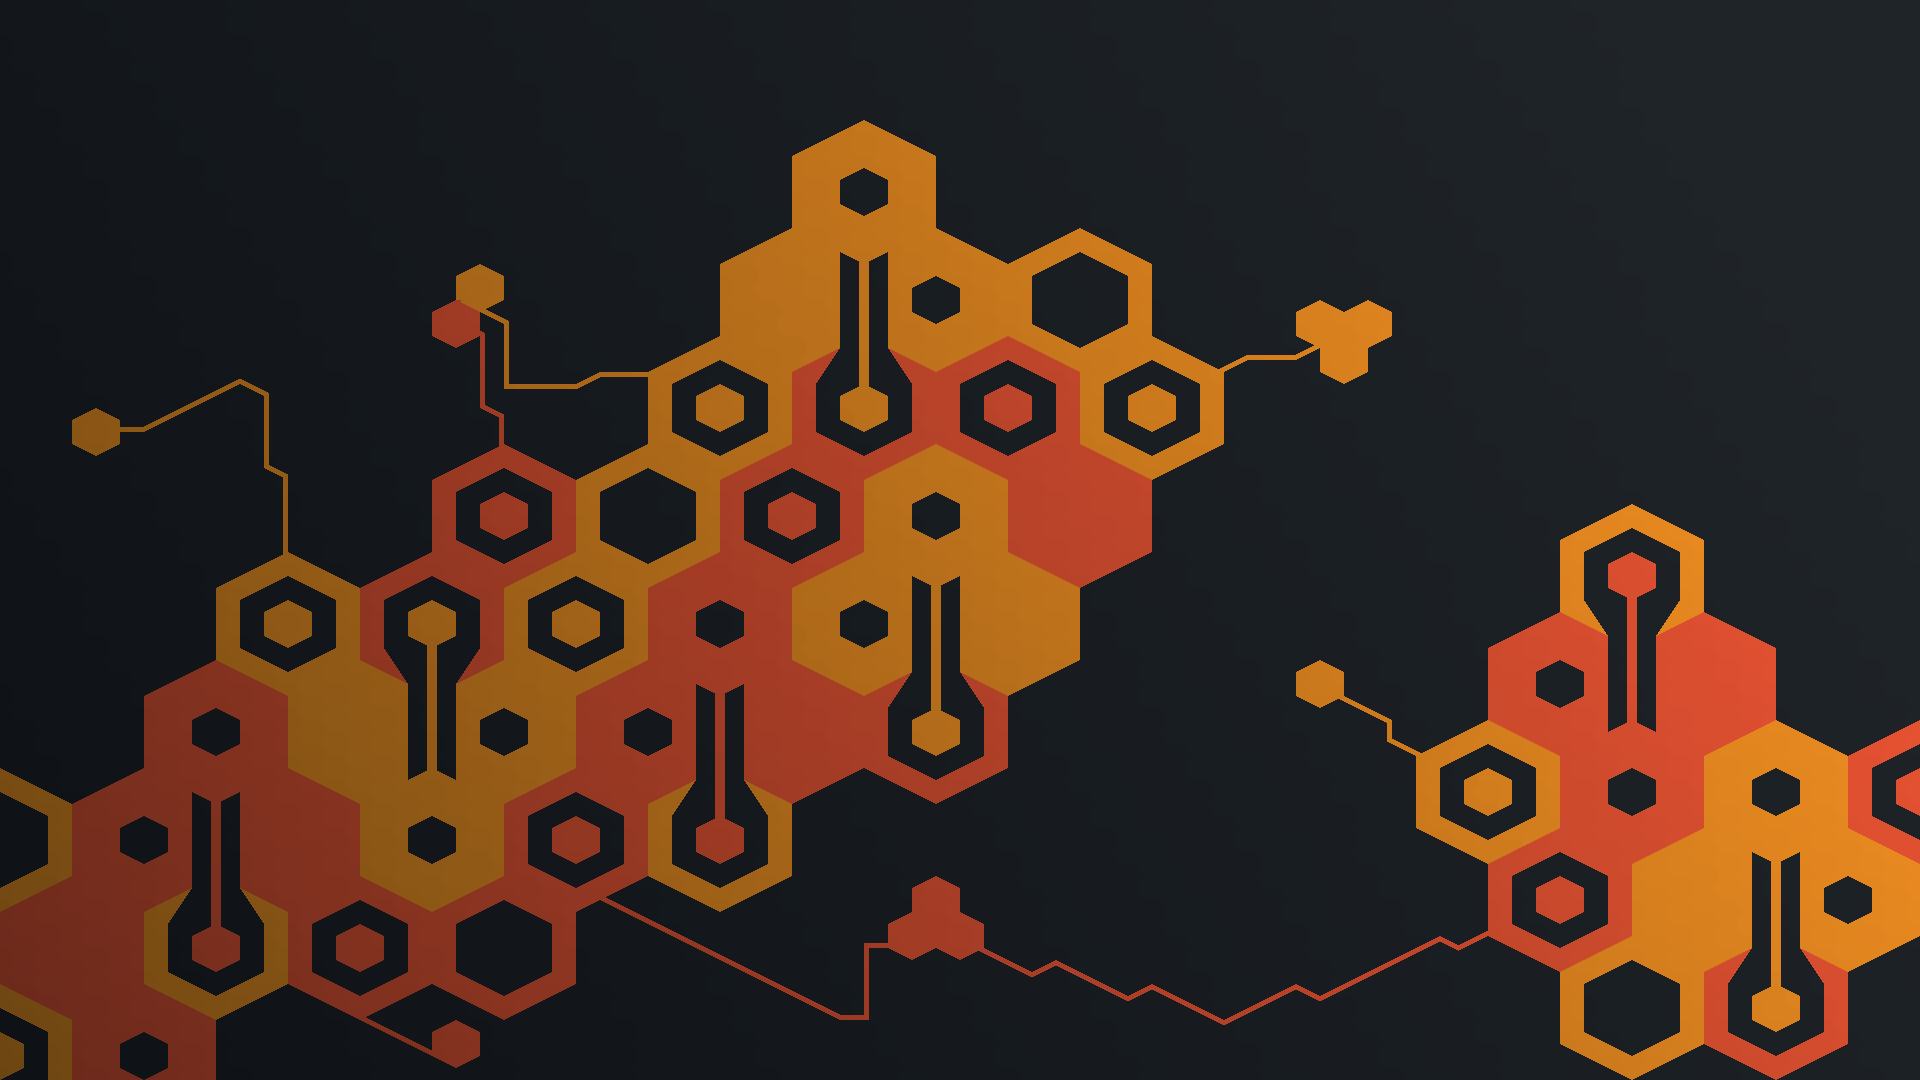 ludum dare 42 honeycomb circuit wallpaperxuelder on newgrounds